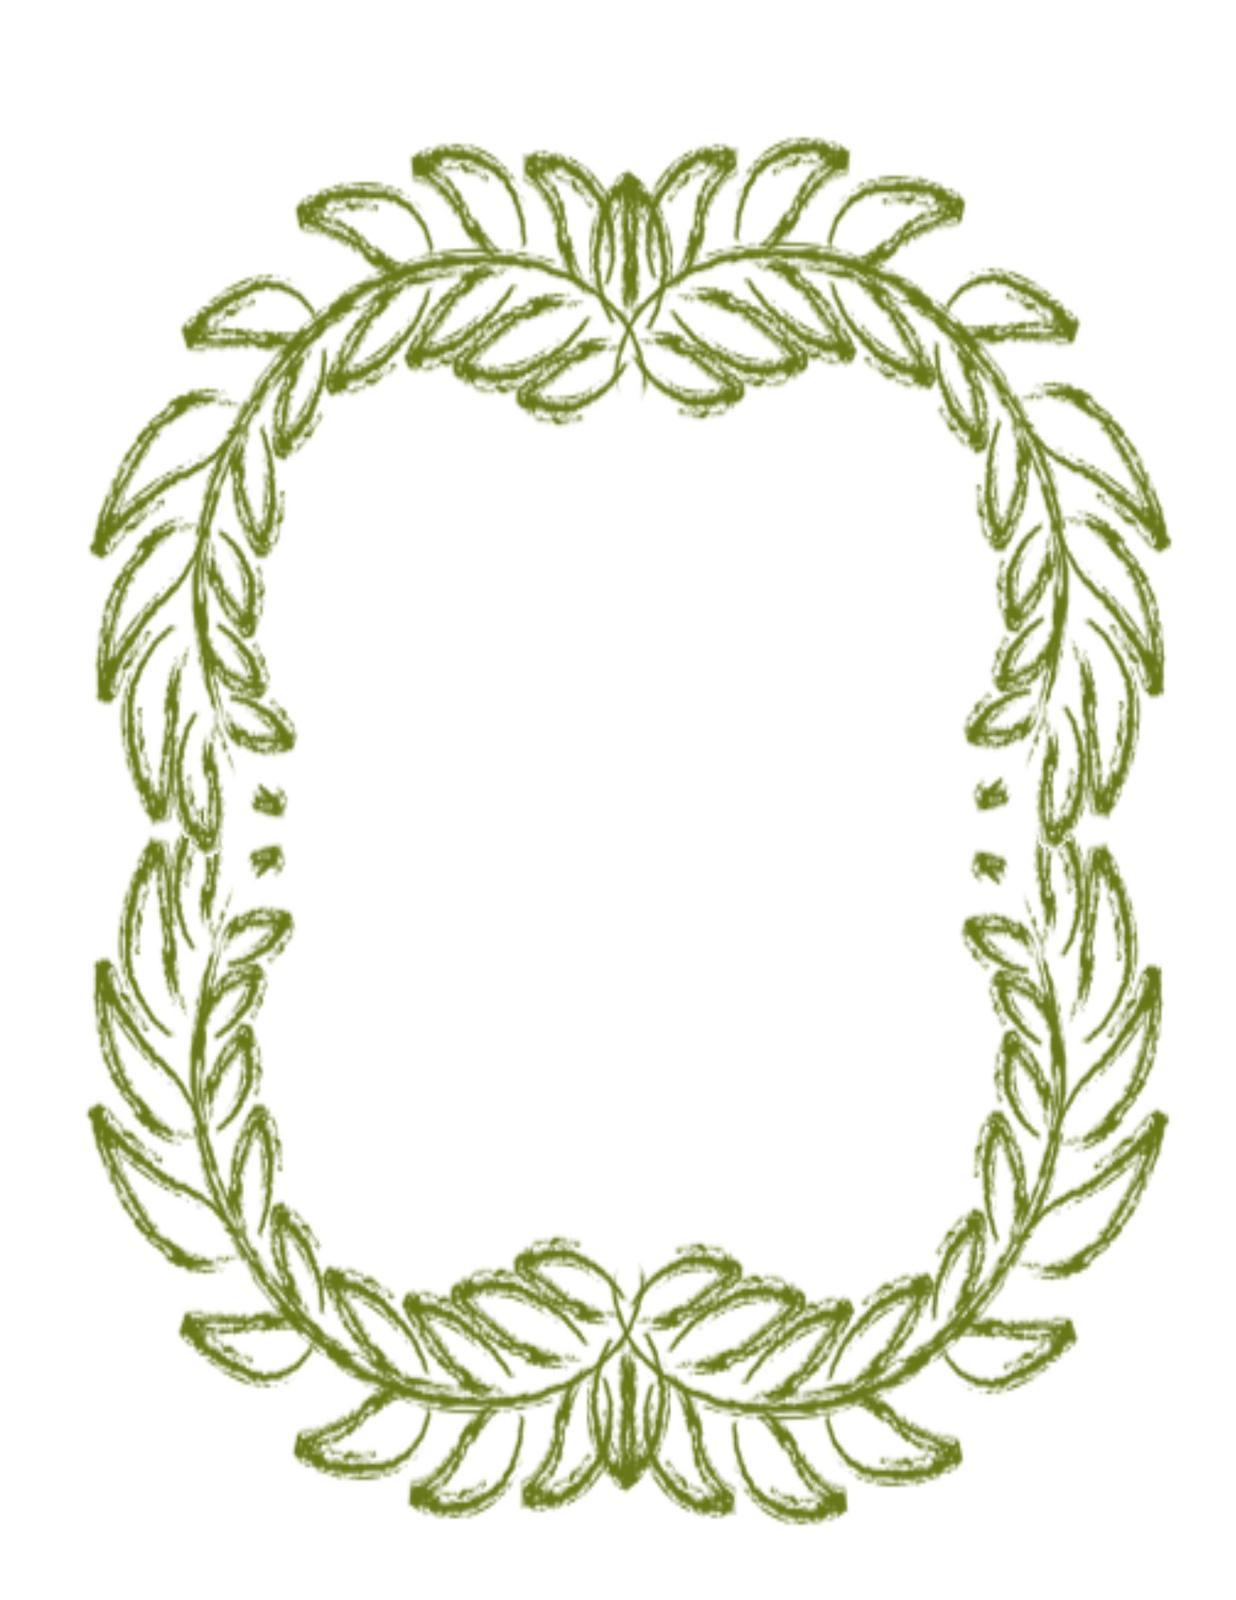 Green floral flower wreath